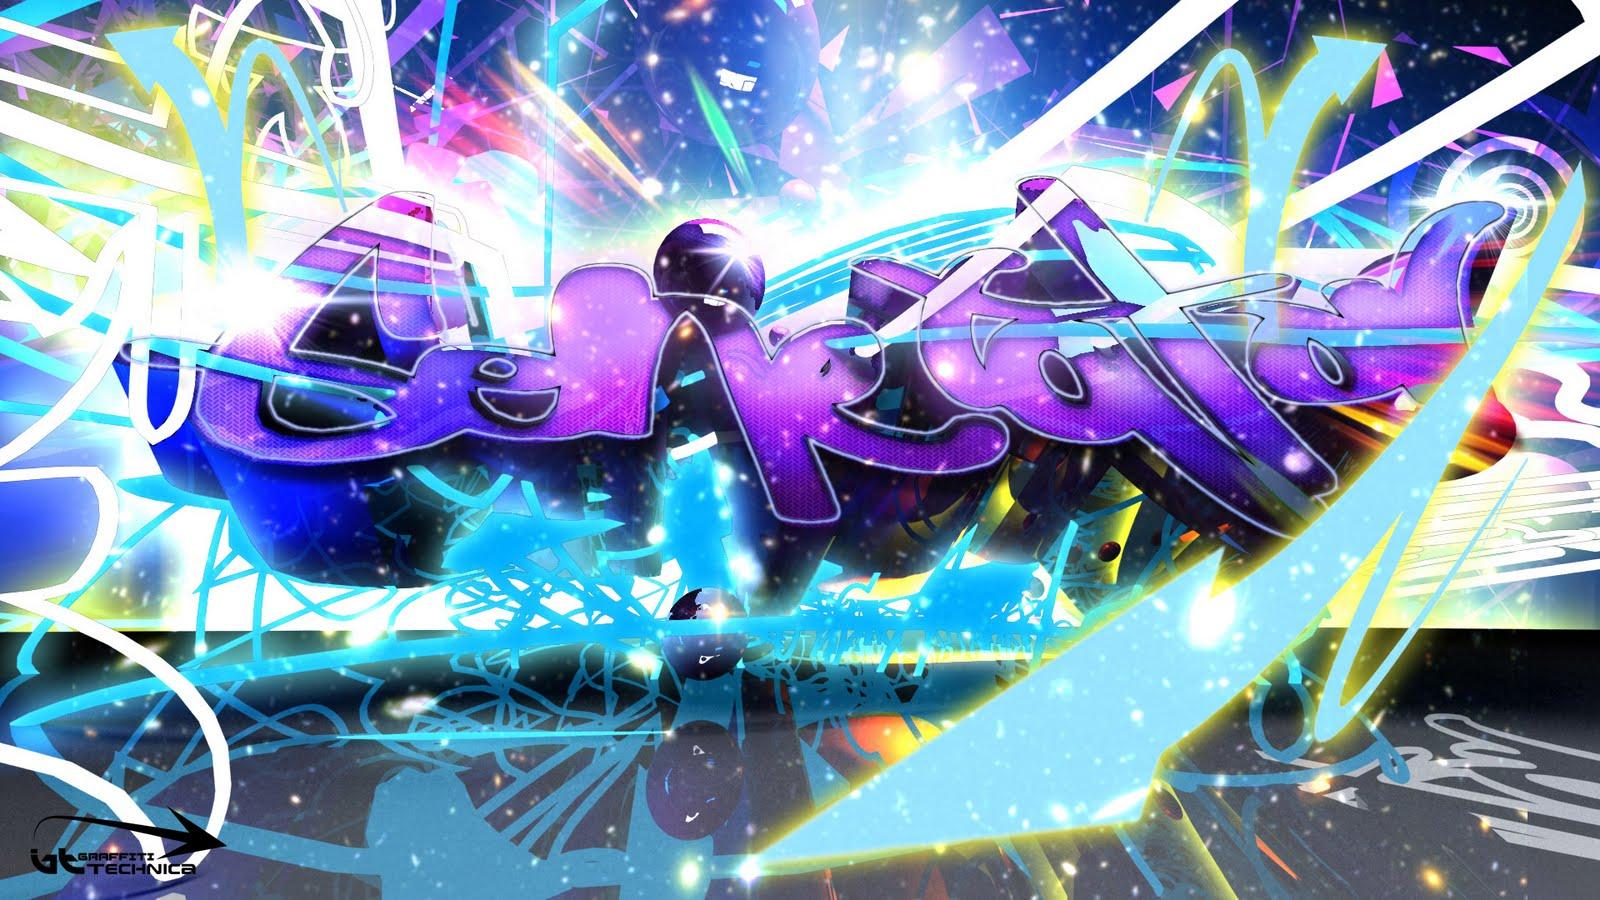 http://3.bp.blogspot.com/-mq-WRYmMPZo/Ta5RTGluFpI/AAAAAAAABAM/SRA7RfcMqFk/s1600/16_graffiti_generator.jpg